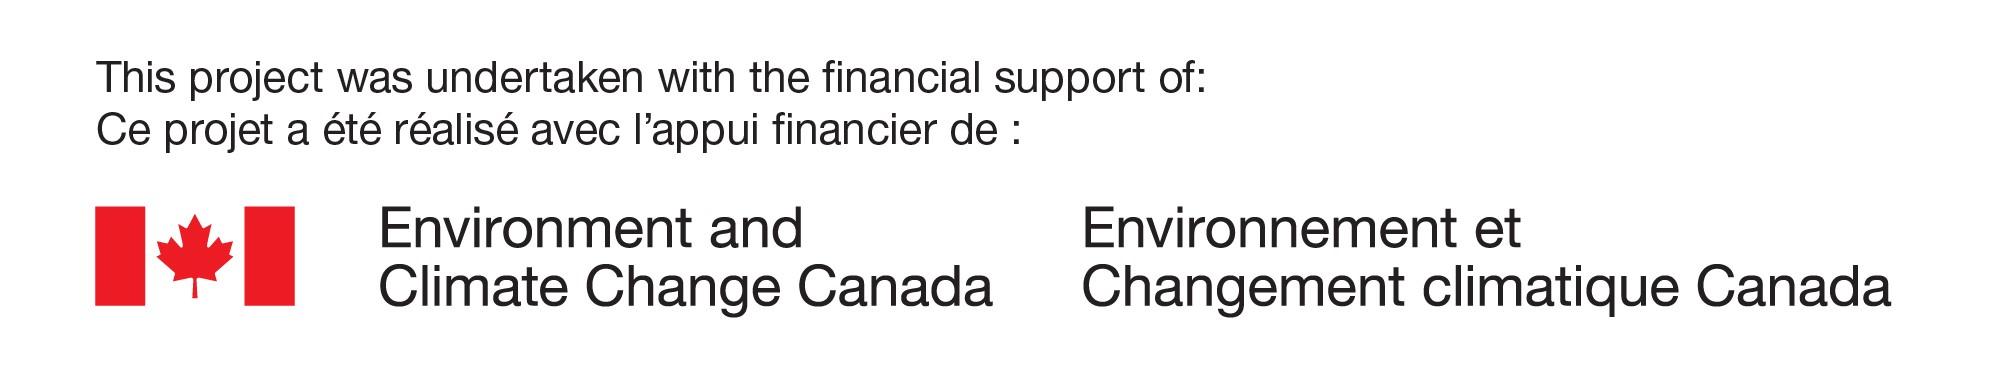 ECCC-recognition-logo.jpg